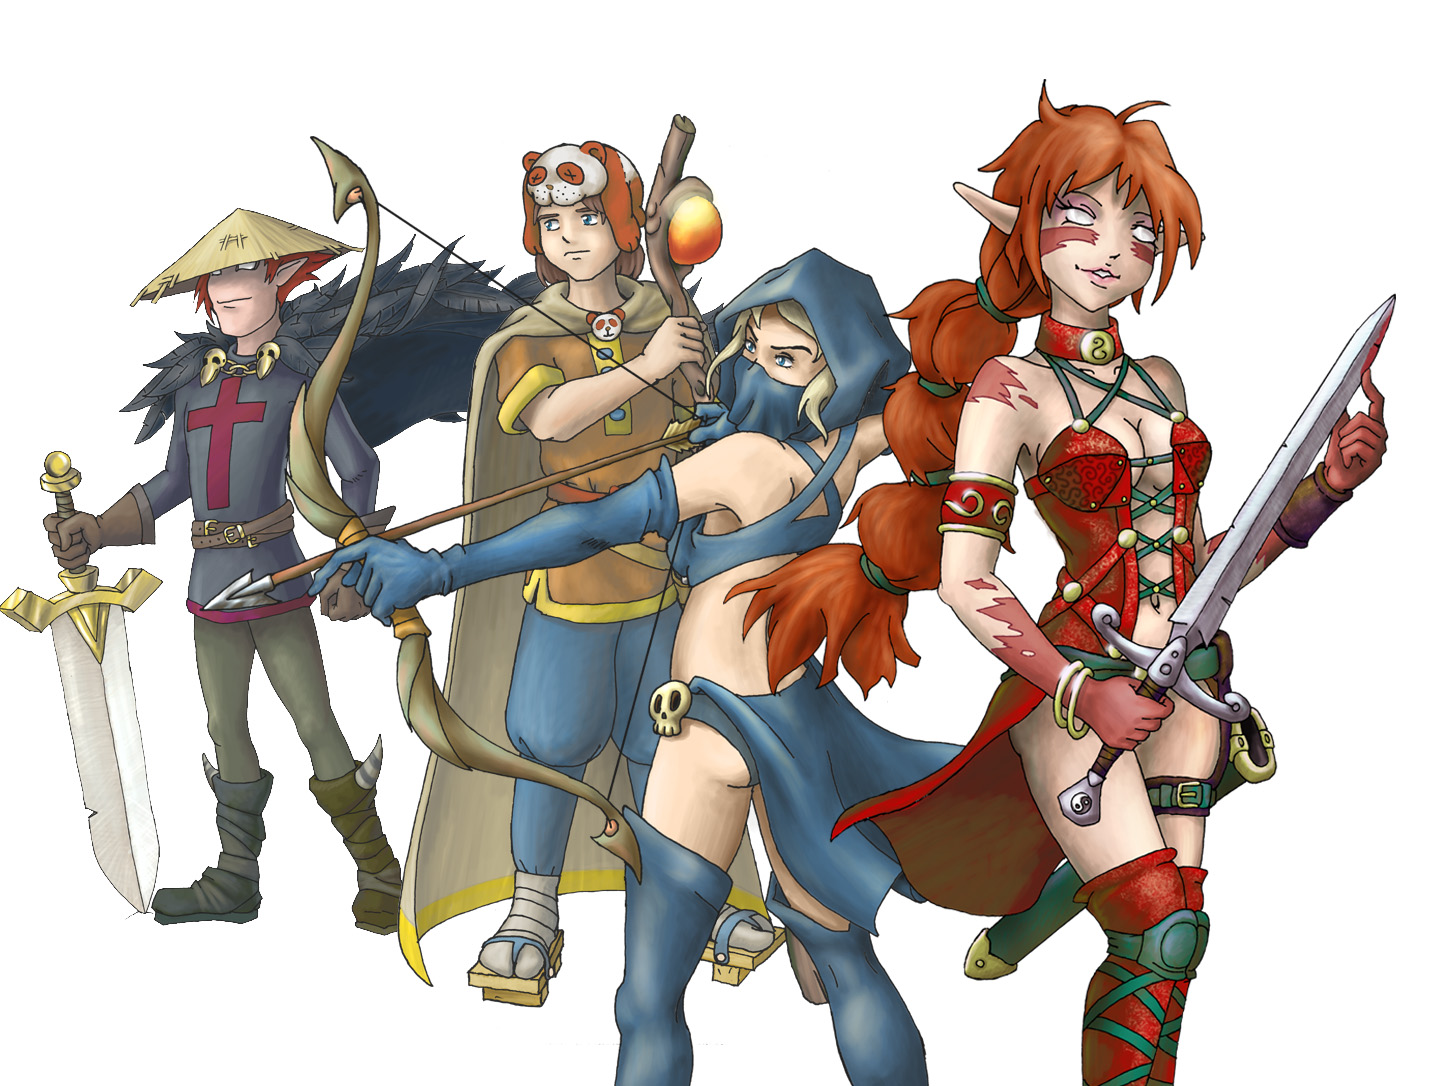 http://4.bp.blogspot.com/-Ymr0LAU3ZQQ/TdqsG3cF6RI/AAAAAAAAAFw/jMrfh9y8VHo/s1600/Dofus_Party_by_NeoWorm.jpg